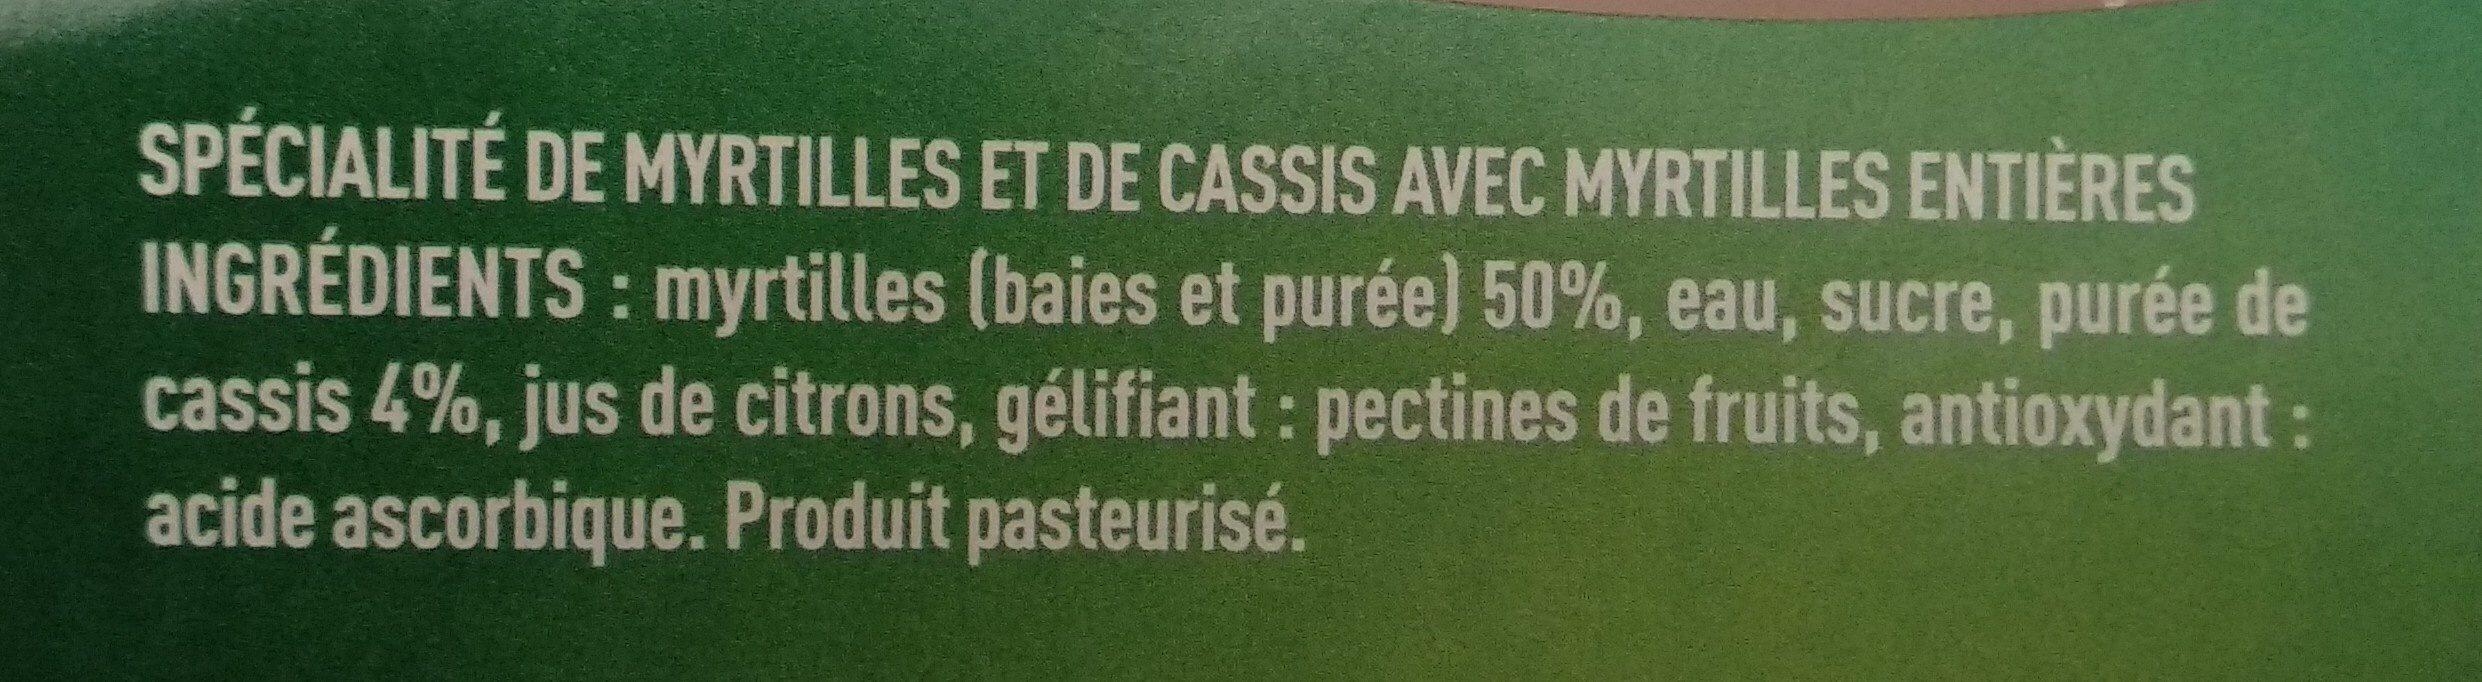 Fraîcheur de myrtilles - Ingredients - fr